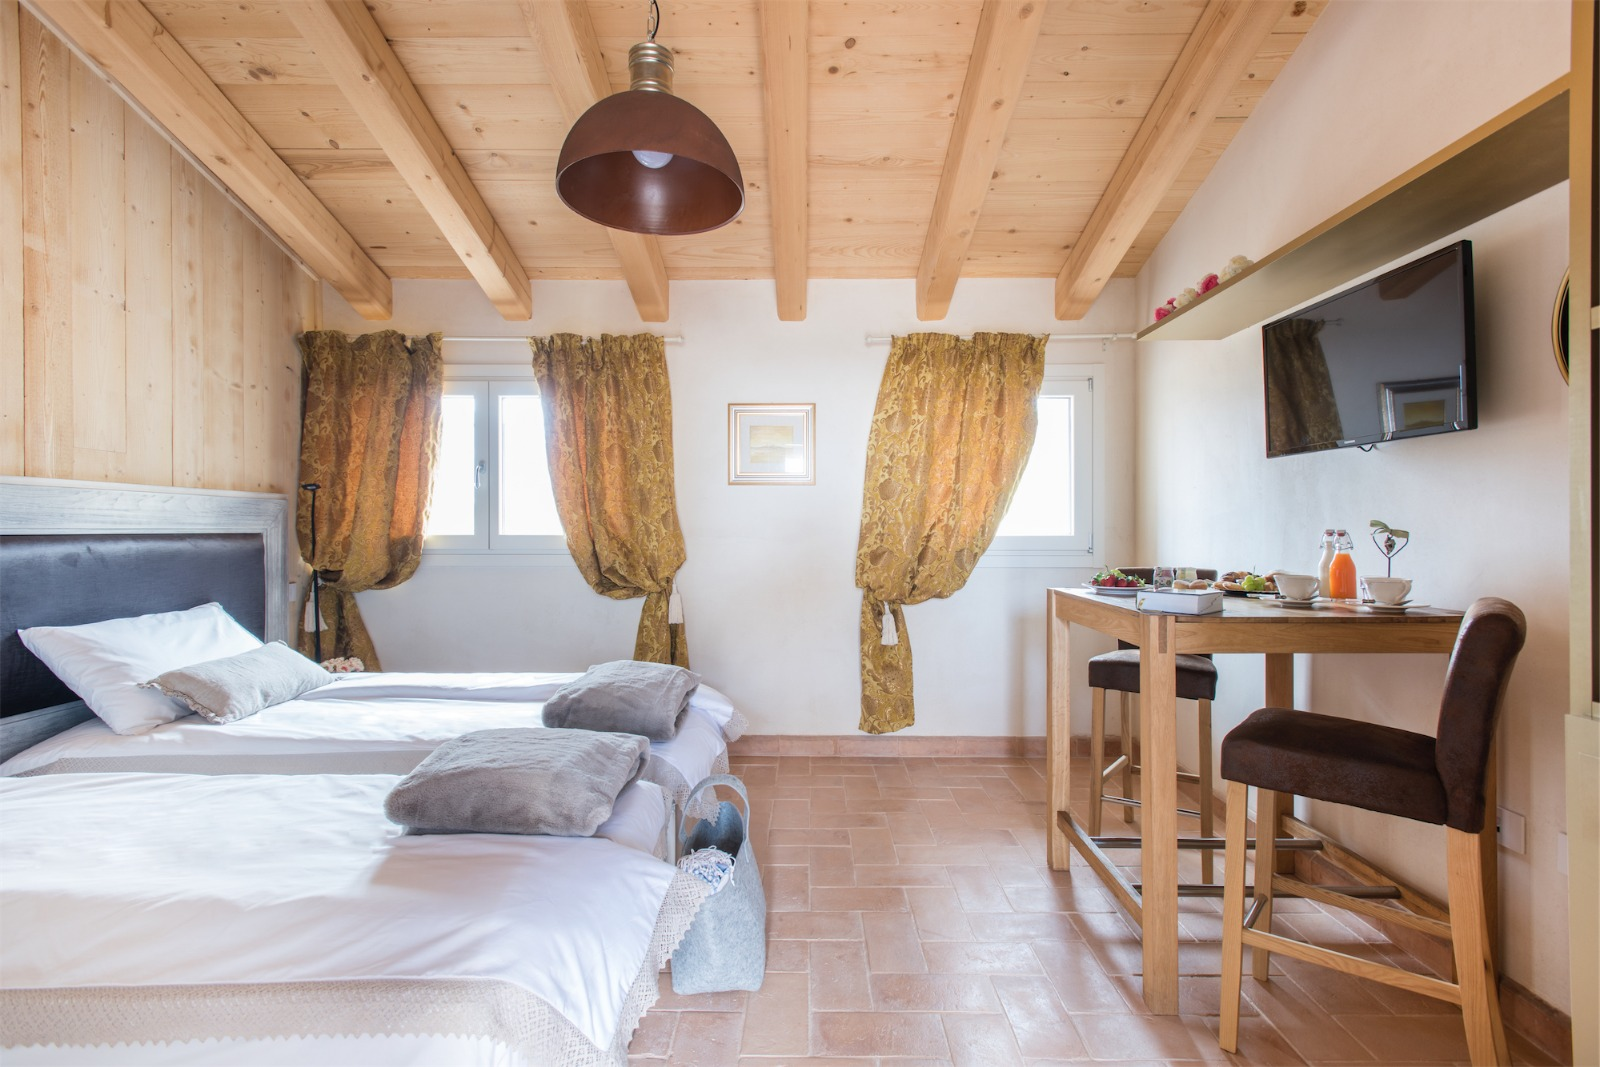 Maso Maroni Luxury Rooms - Olio